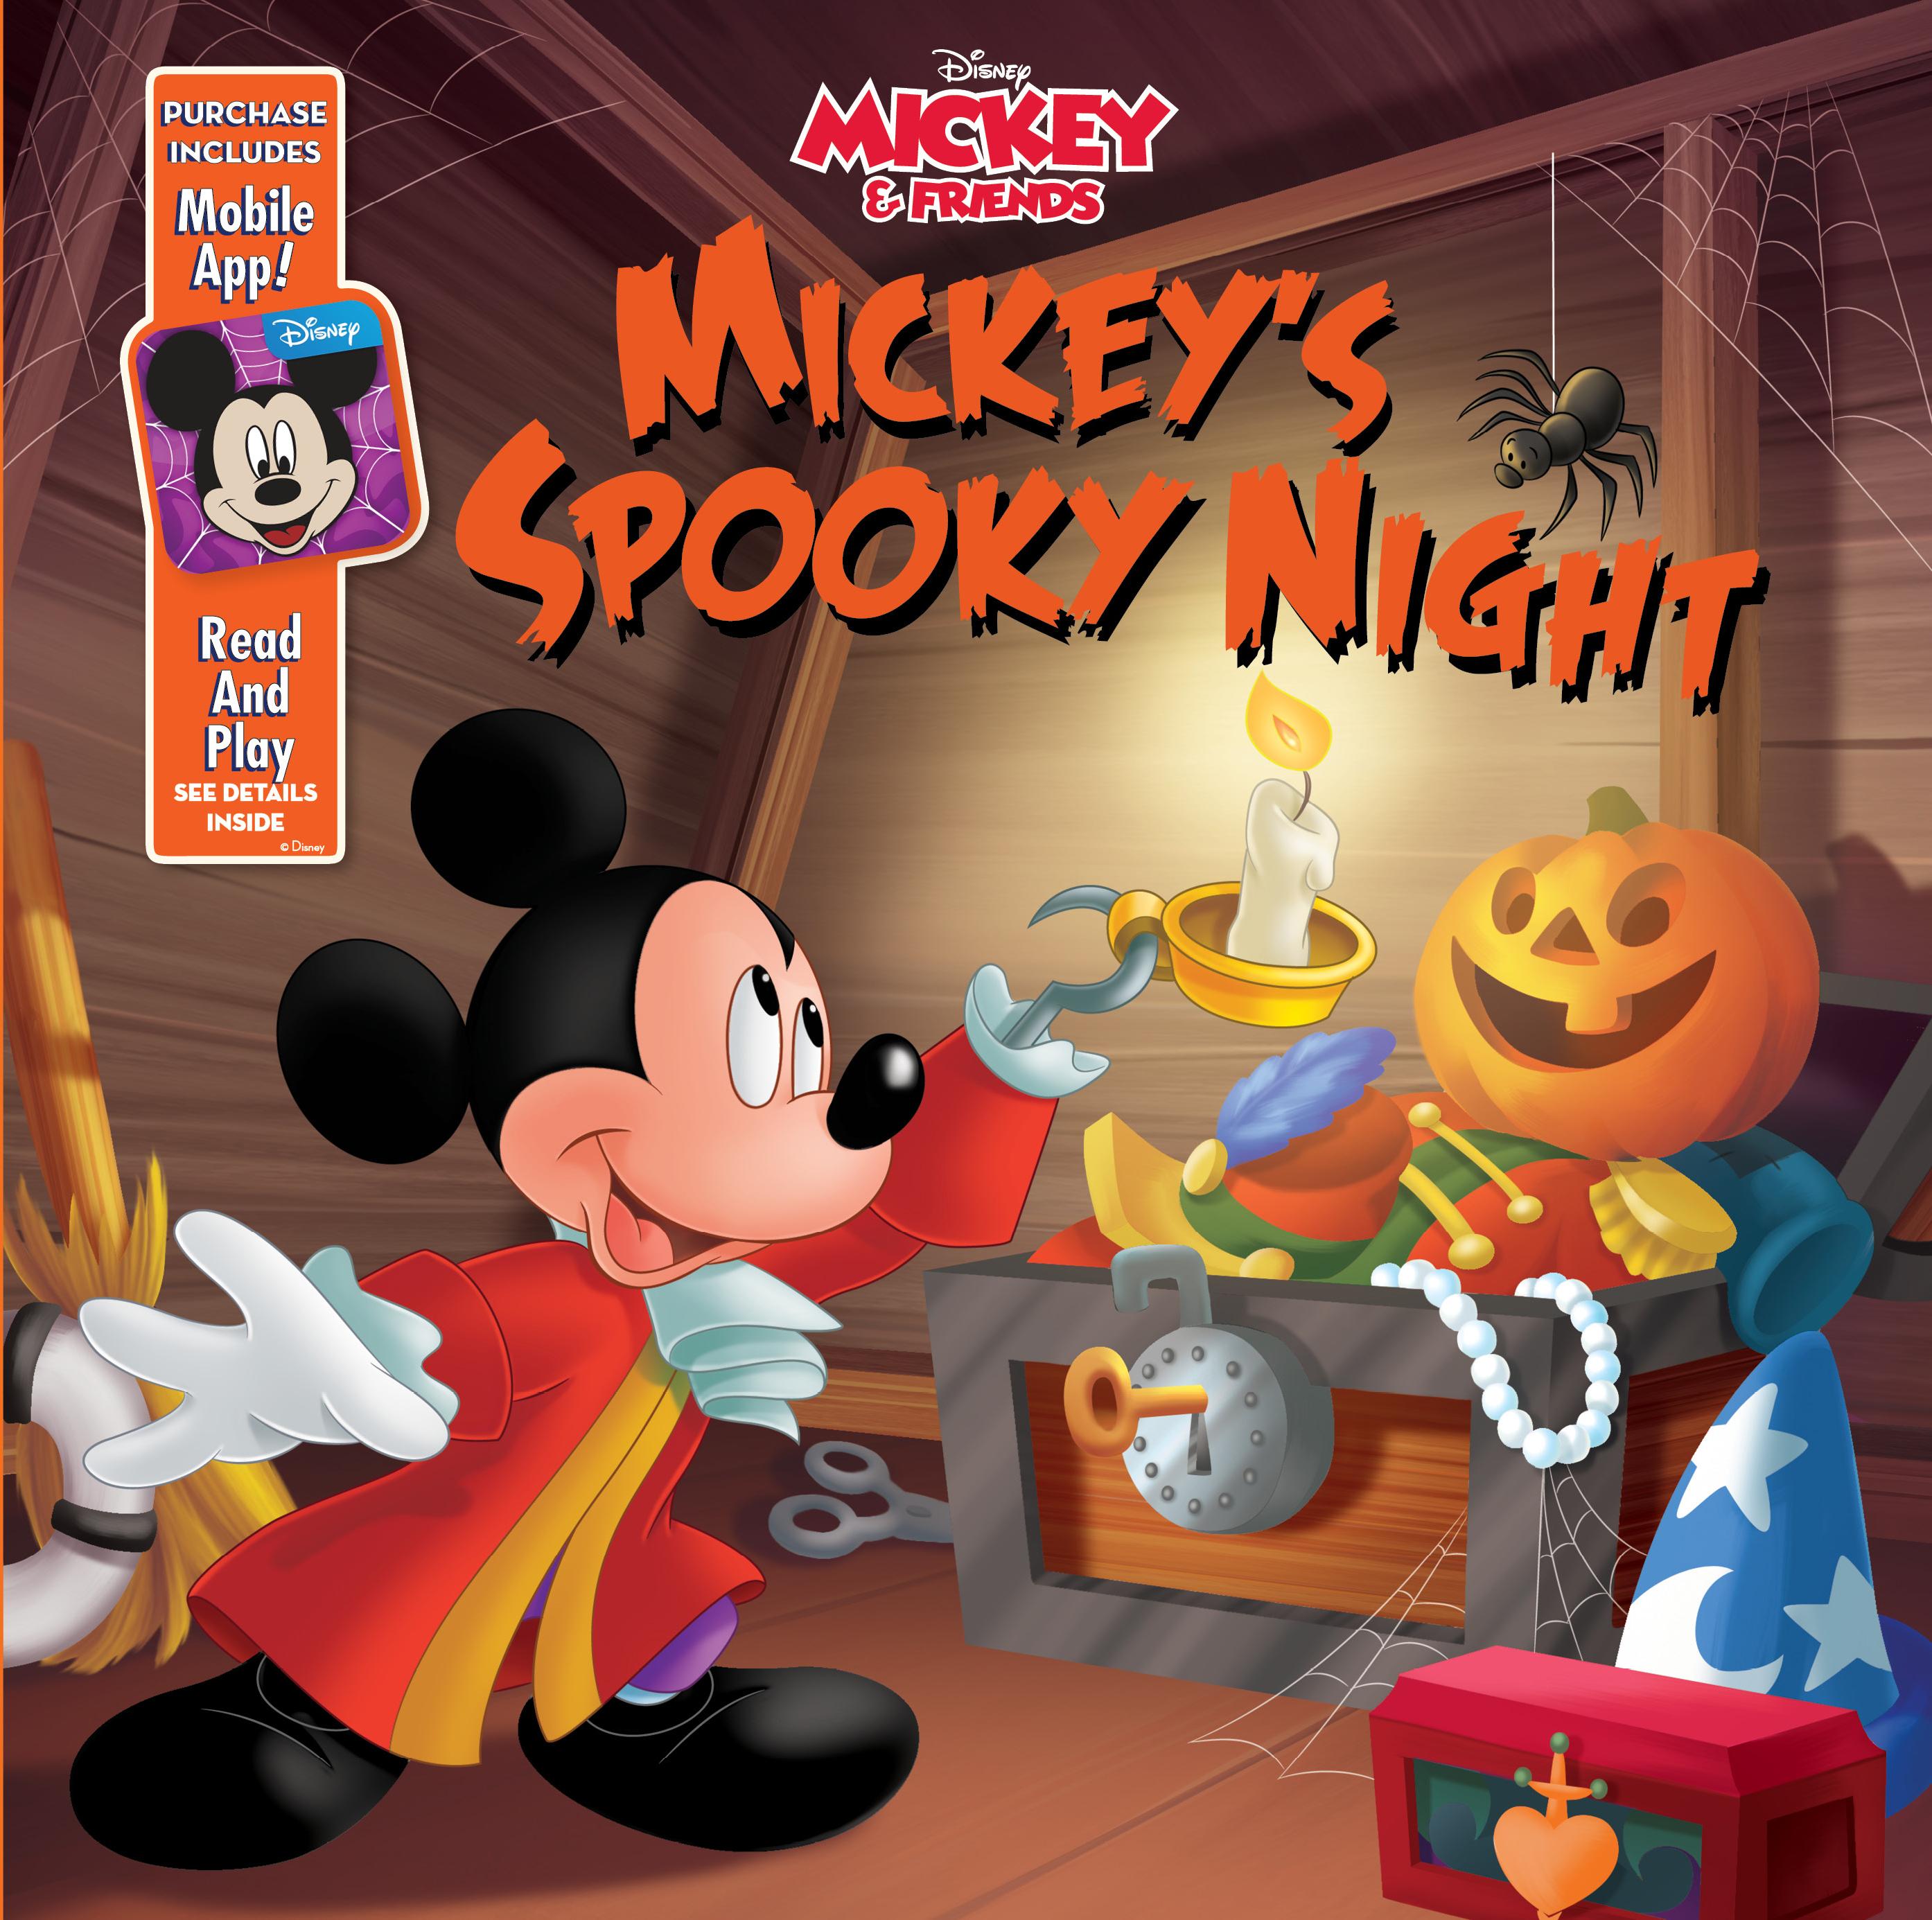 Mickey & Friends:  Mickey's Spooky Night